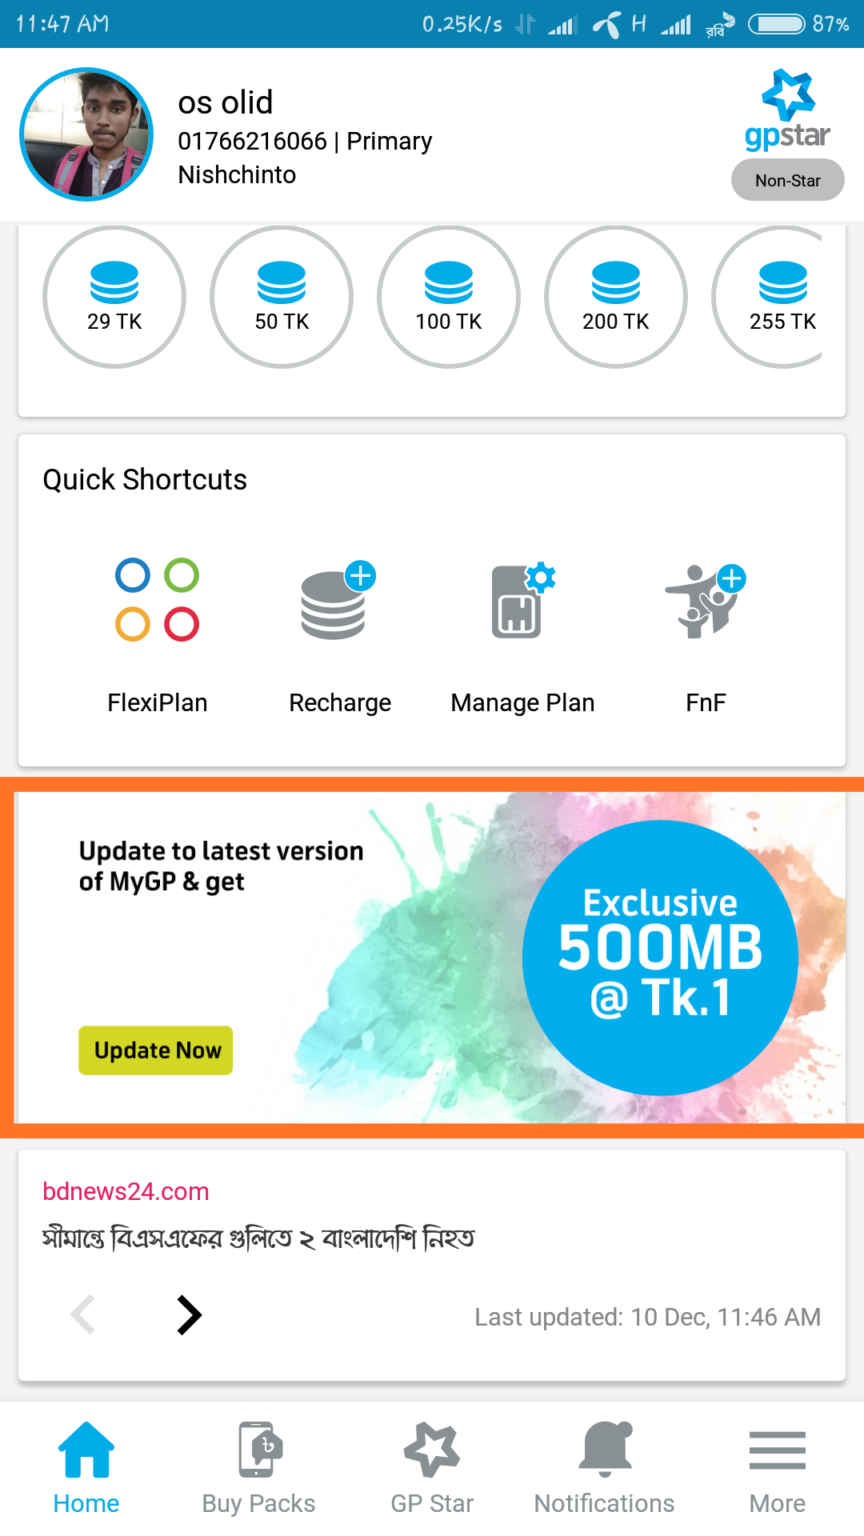 My Gp app update করে নিয়ে নিন ১ টাকায় ৫০০ এমবি। সবাই পাবেন।